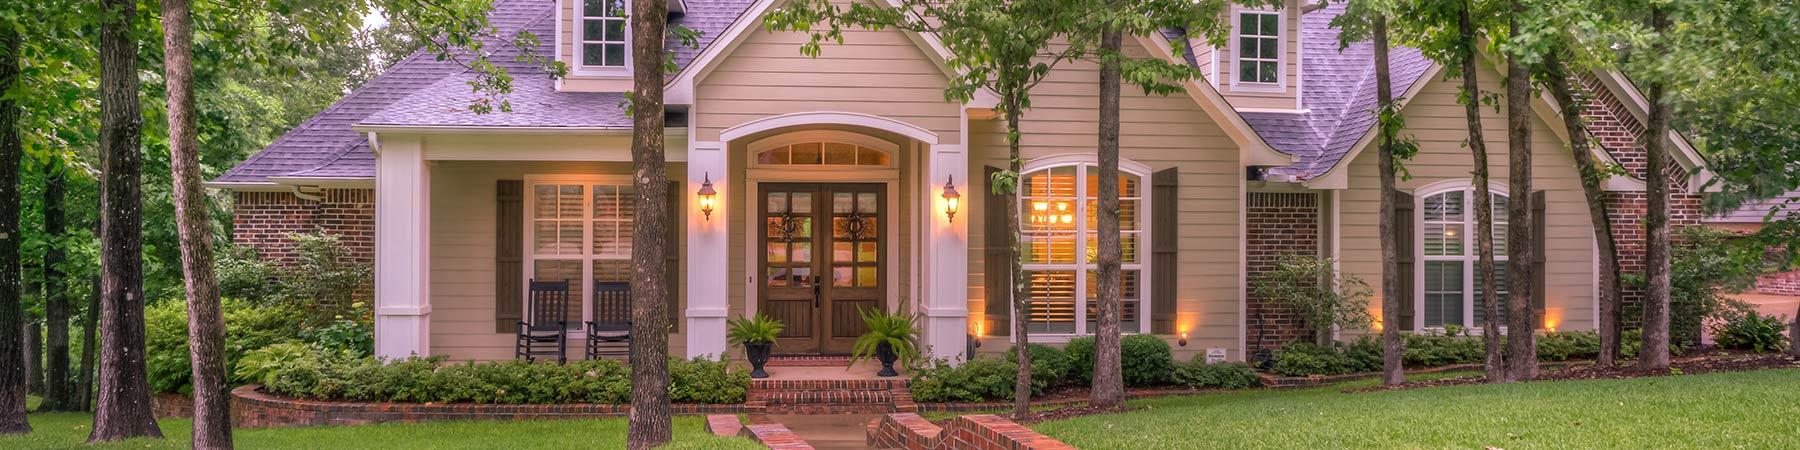 Renter's Insurance in Matthews, NC, Gastonia, Charlotte, Concord, NC